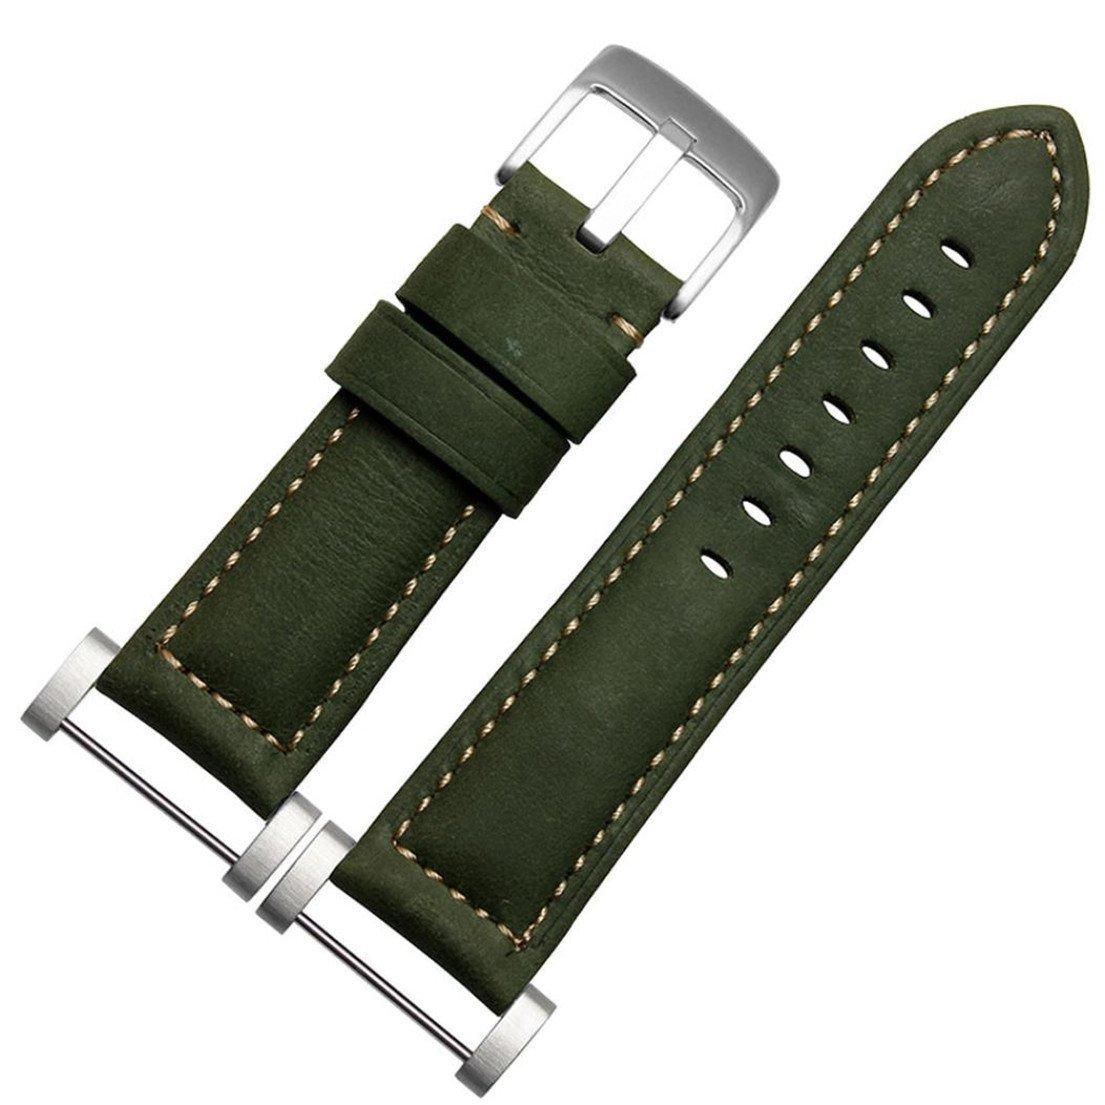 AloneA GenuineLeather Watch交換用バンドストラップ+ラグアダプタfor Suunto Core グリーン グリーン B01LZCPEXM